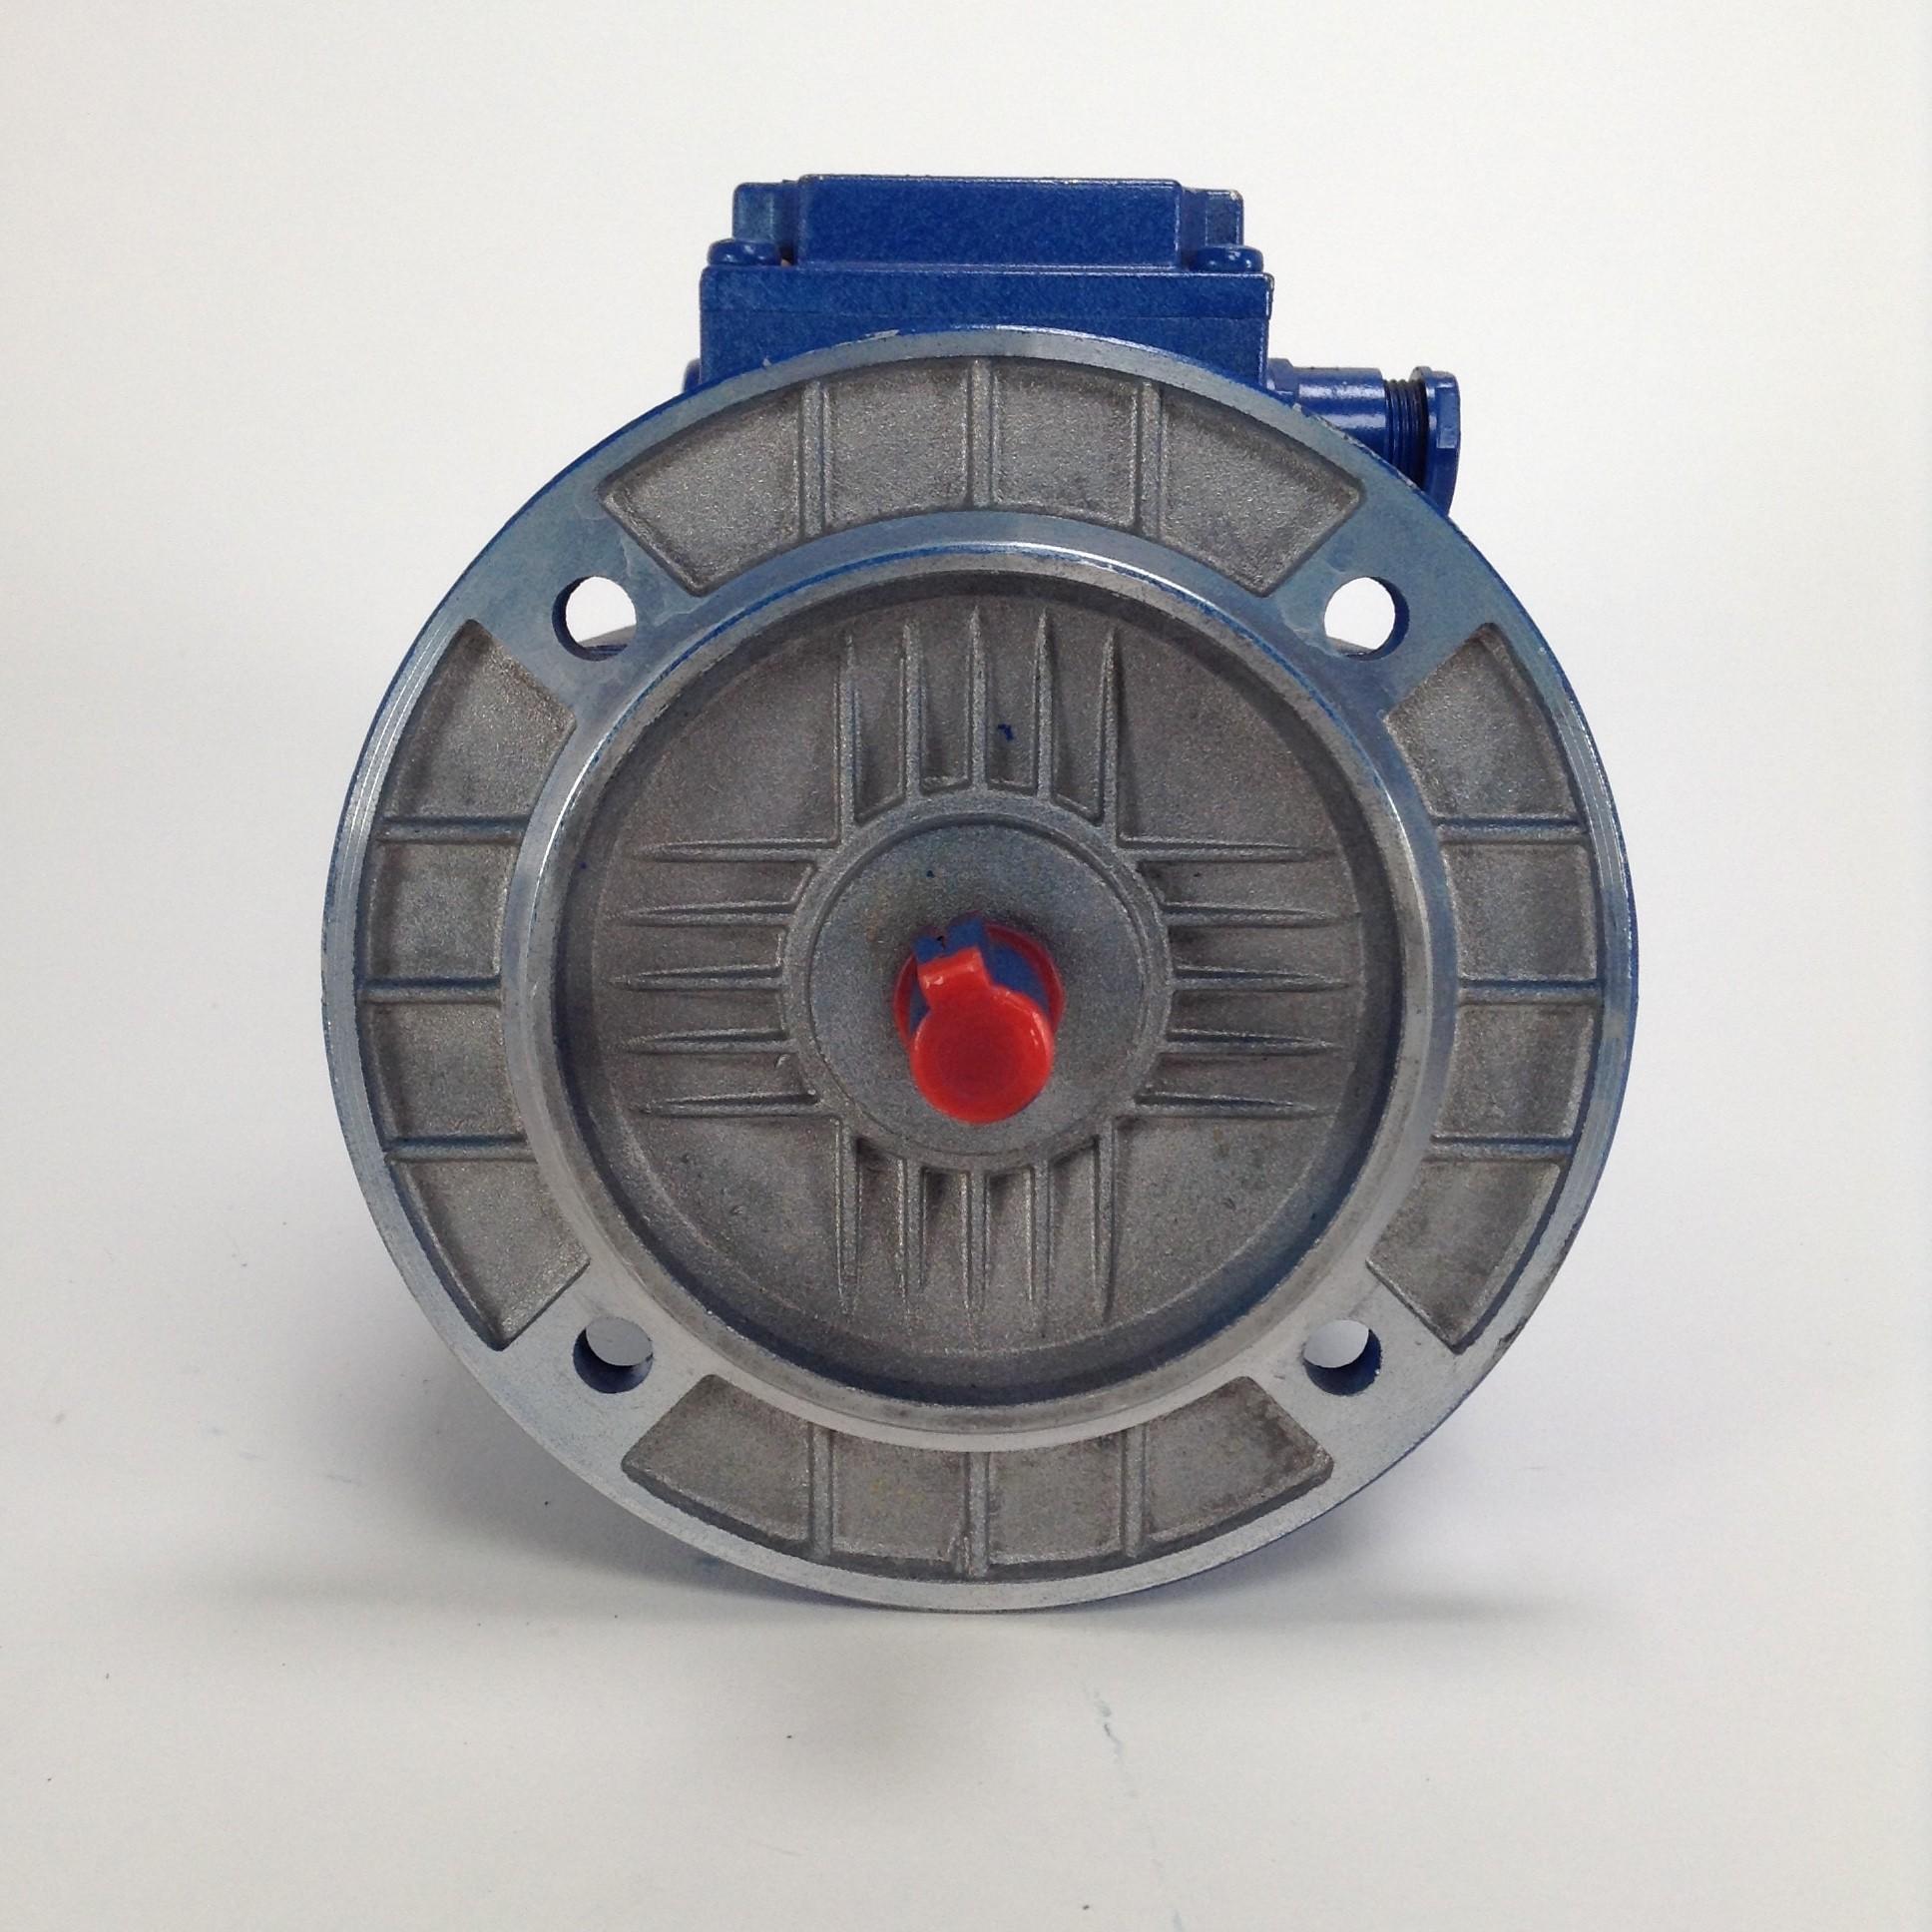 Seimec HF71B4B5 Gearmotor HF 71B 4 B5 220//380V 60Hz 0.44kW 1685rpm Used UMP